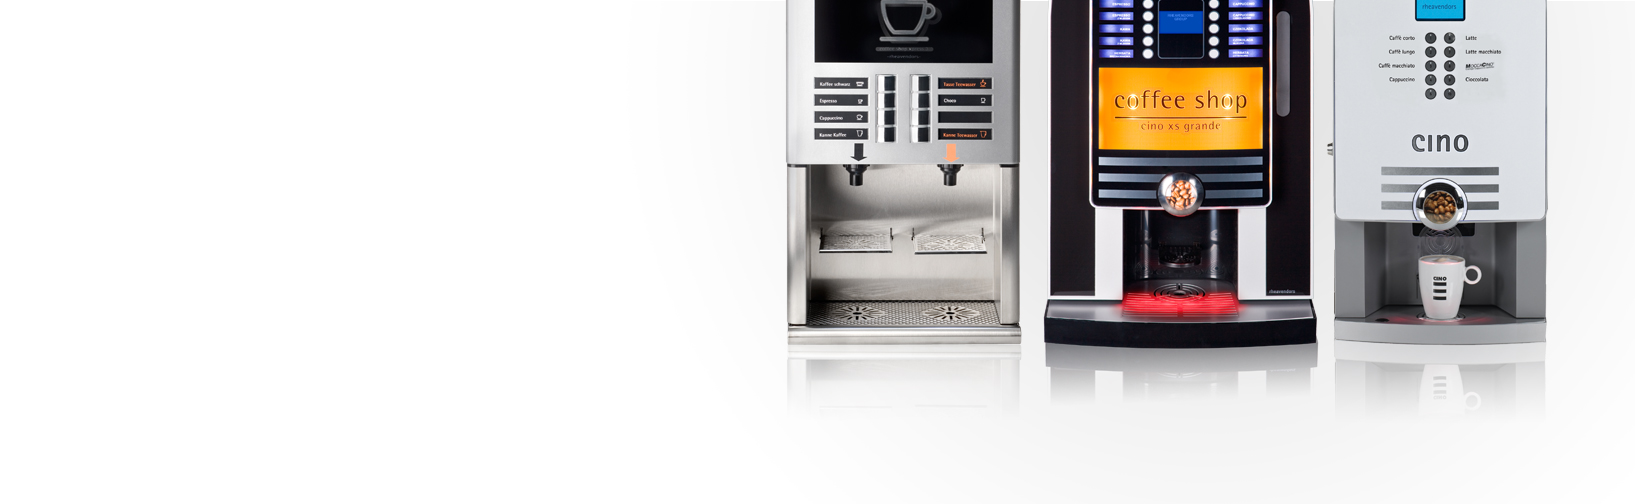 Bogata oferta automatów do kawy